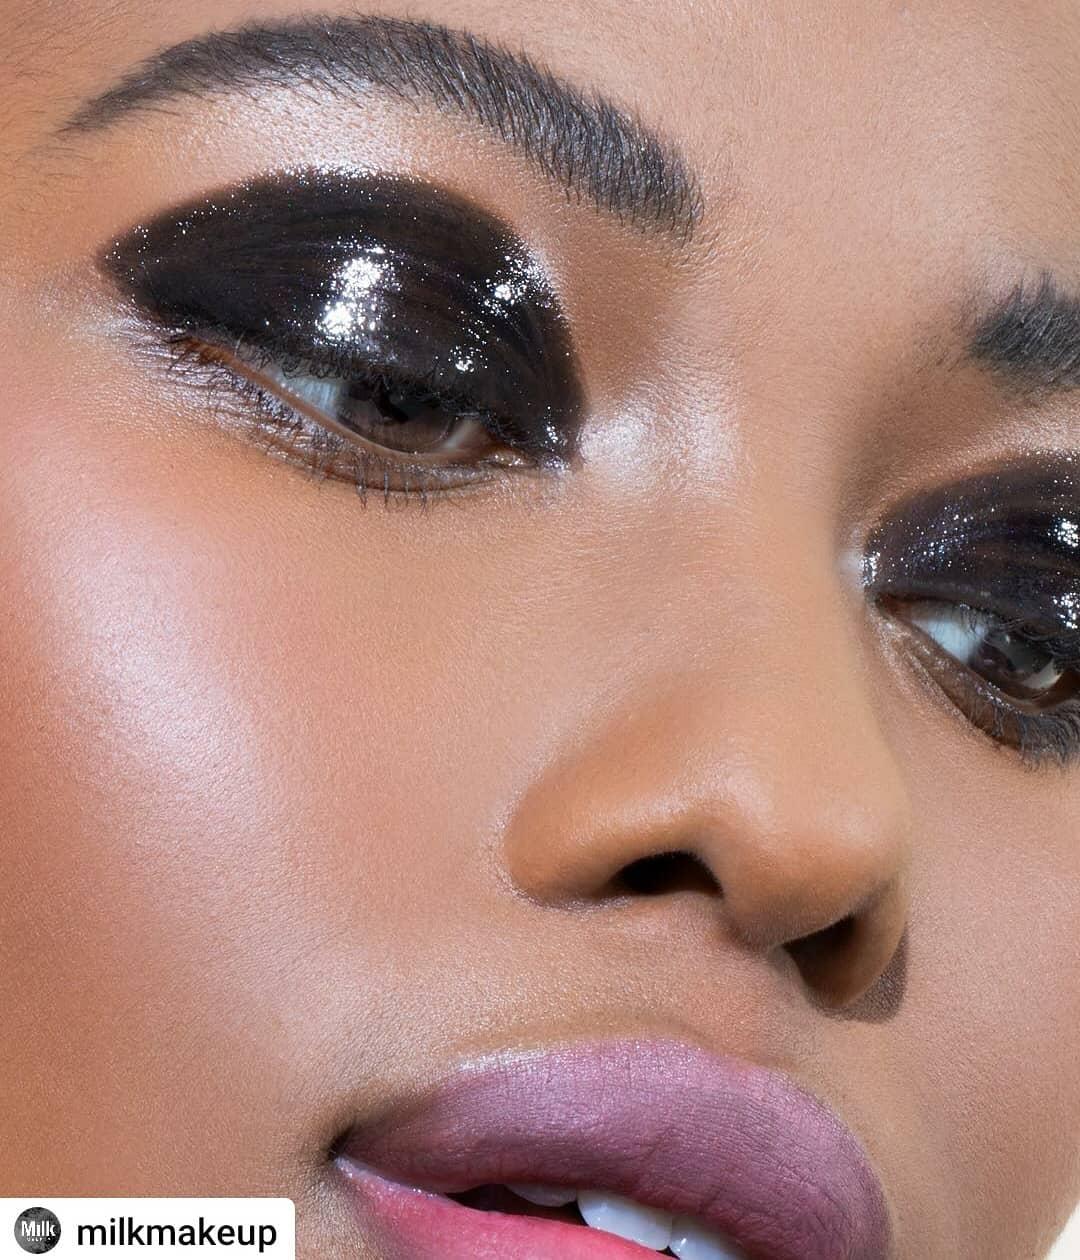 Candace Smith – Milk Makeup